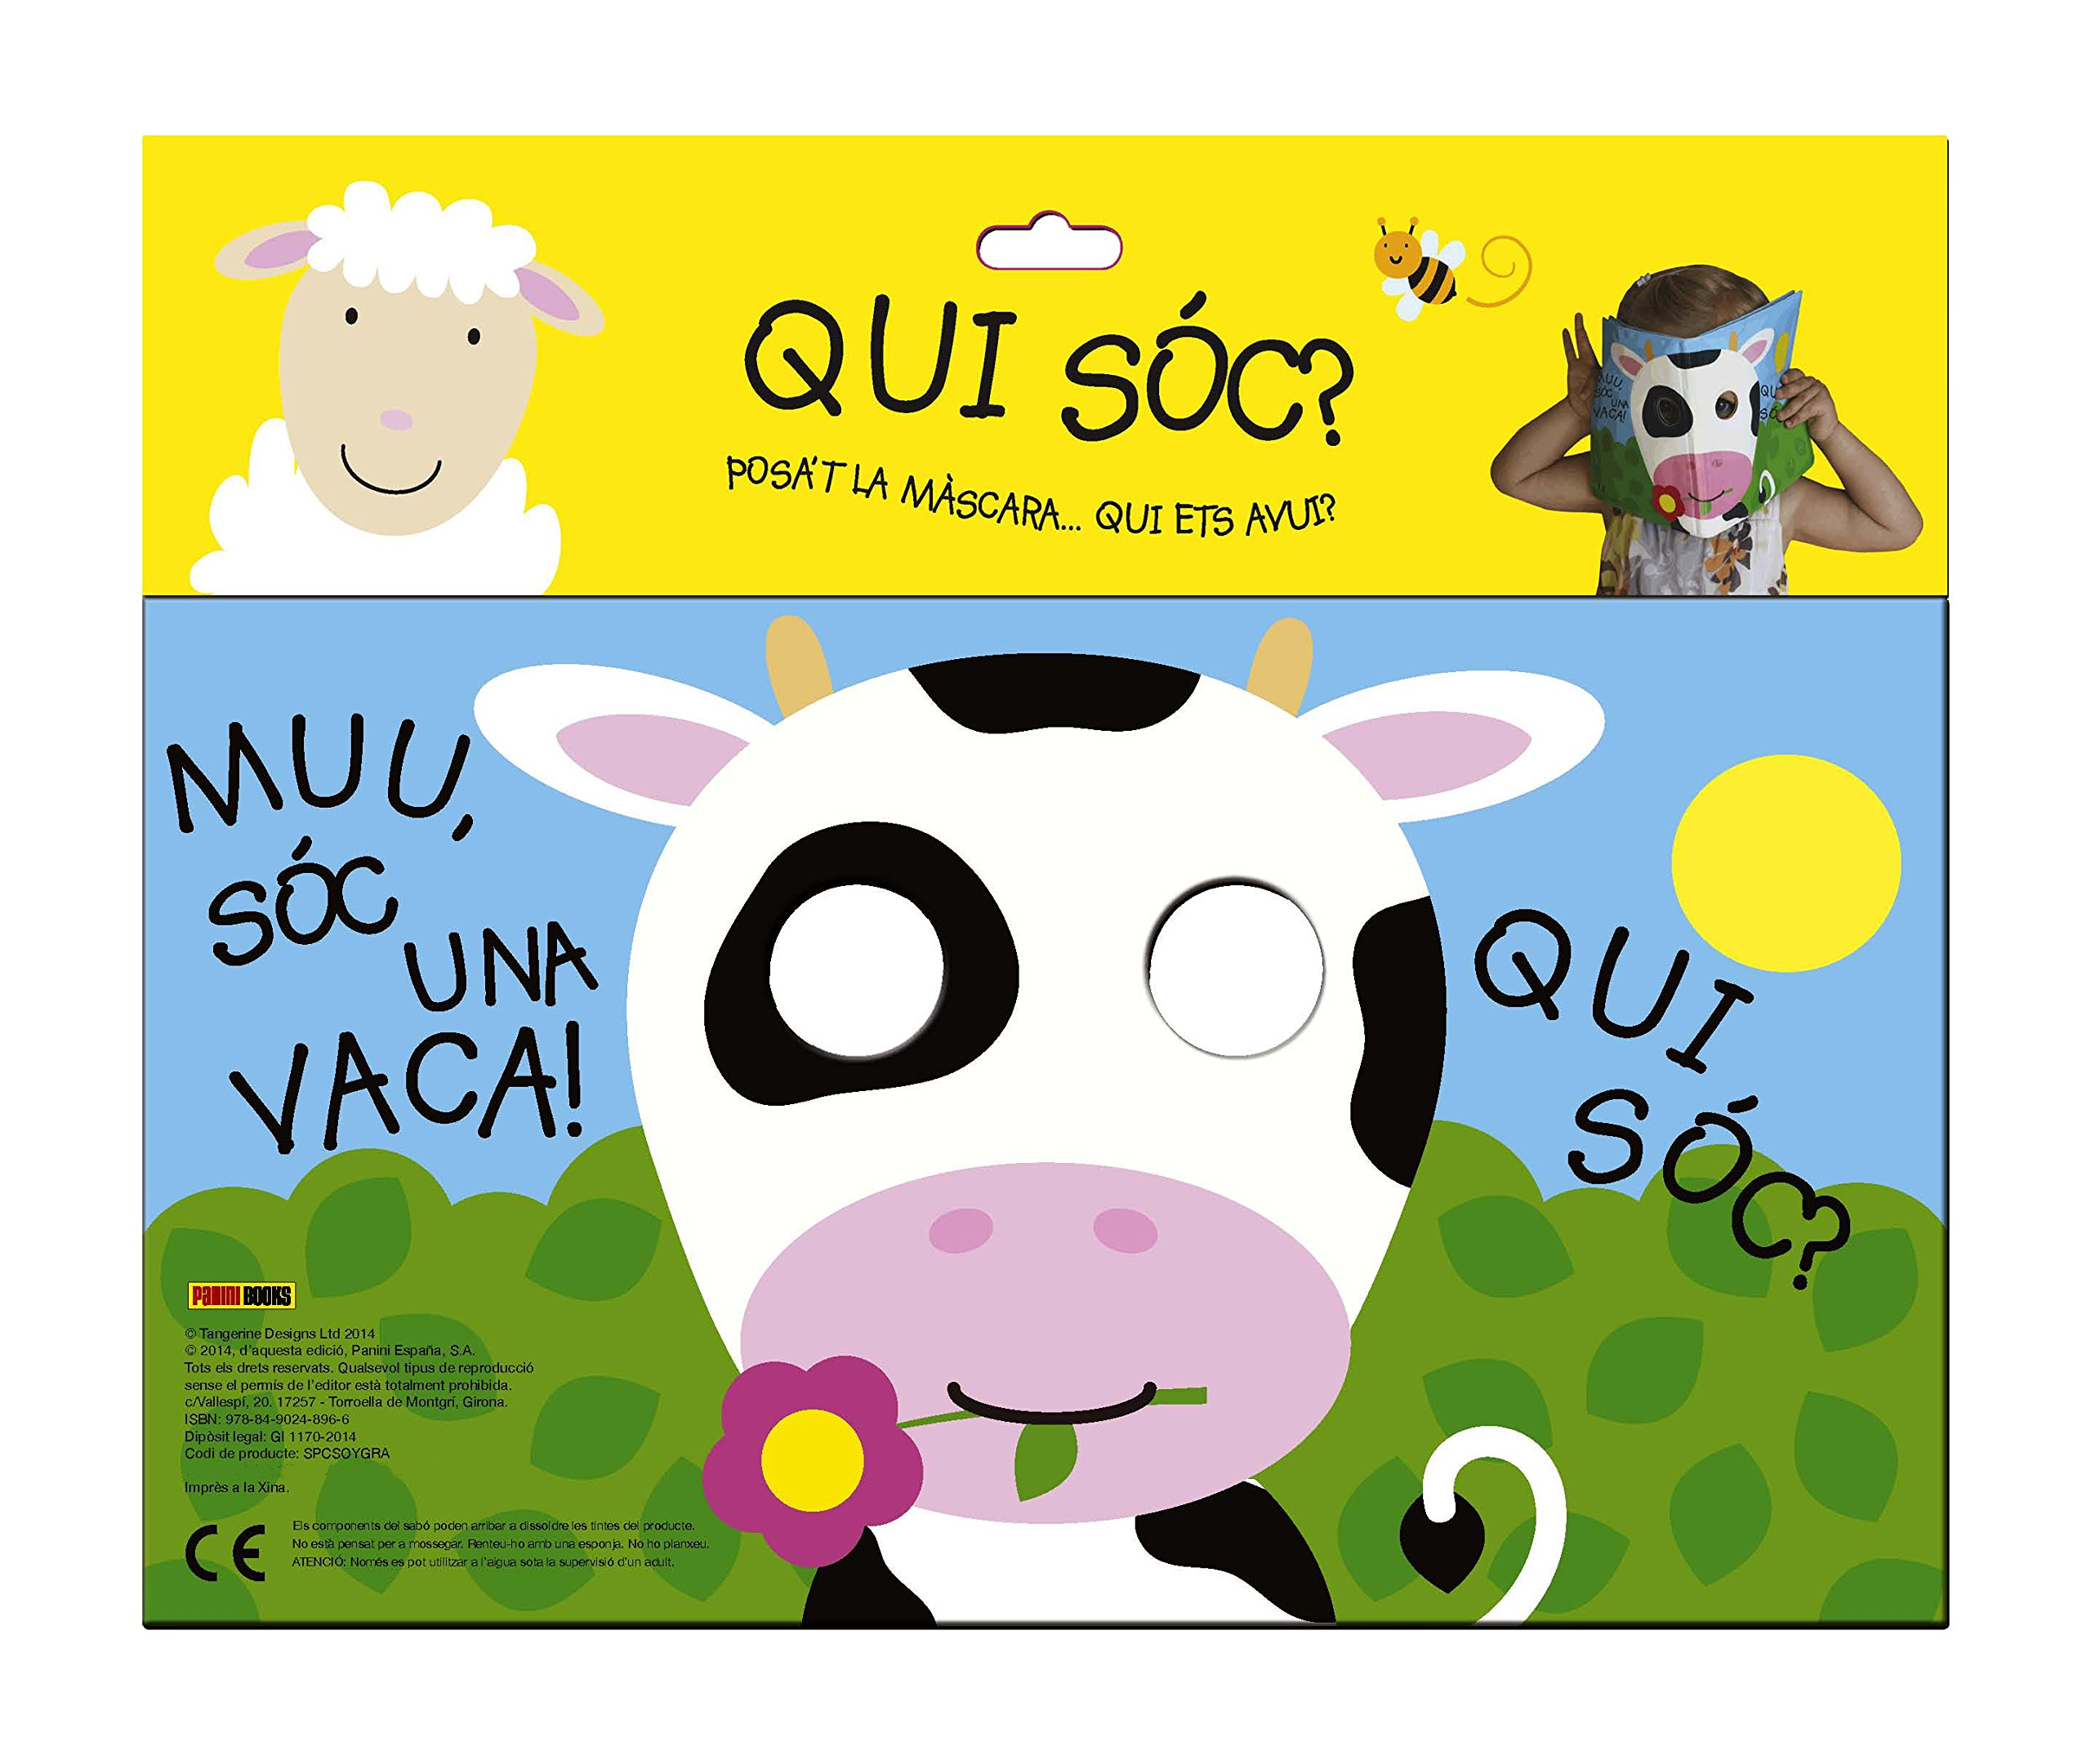 MUU SOC UNA VACA.(QUI SOC?): 9788490248966: Amazon.com: Books